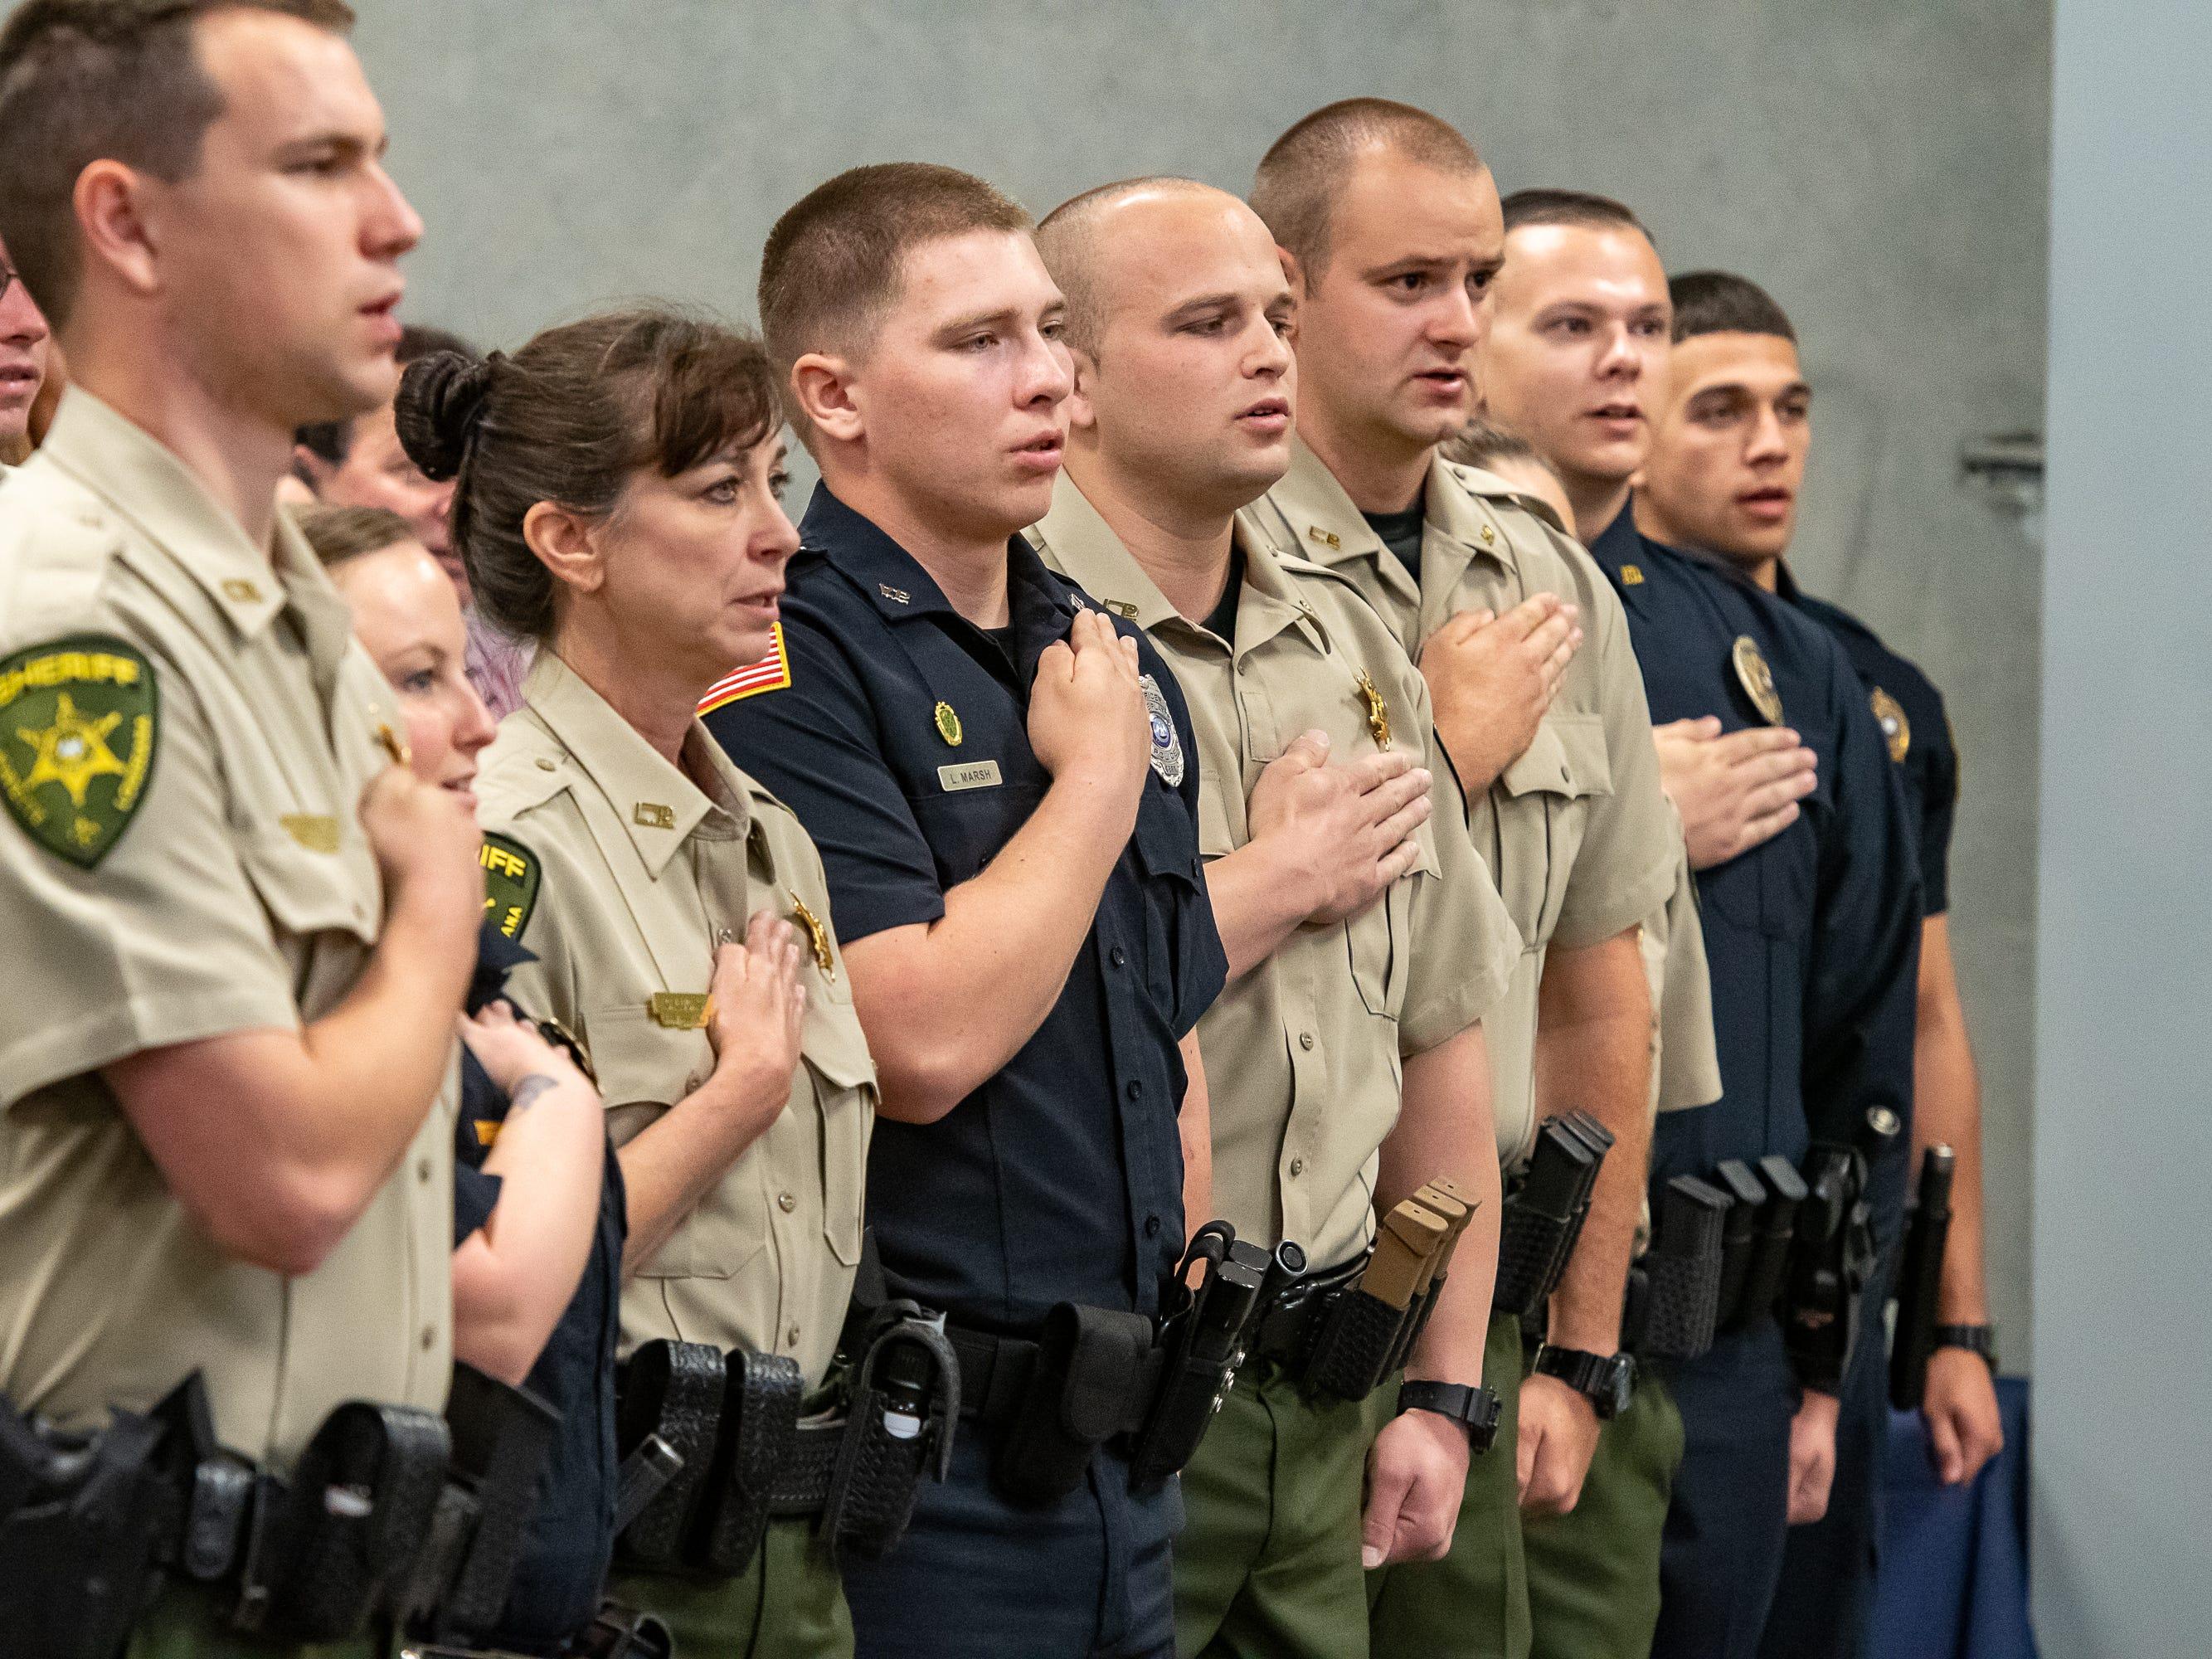 Graduation of Acadiana Law Enforcement Training Academy Class 159. Friday, April 12, 2019.